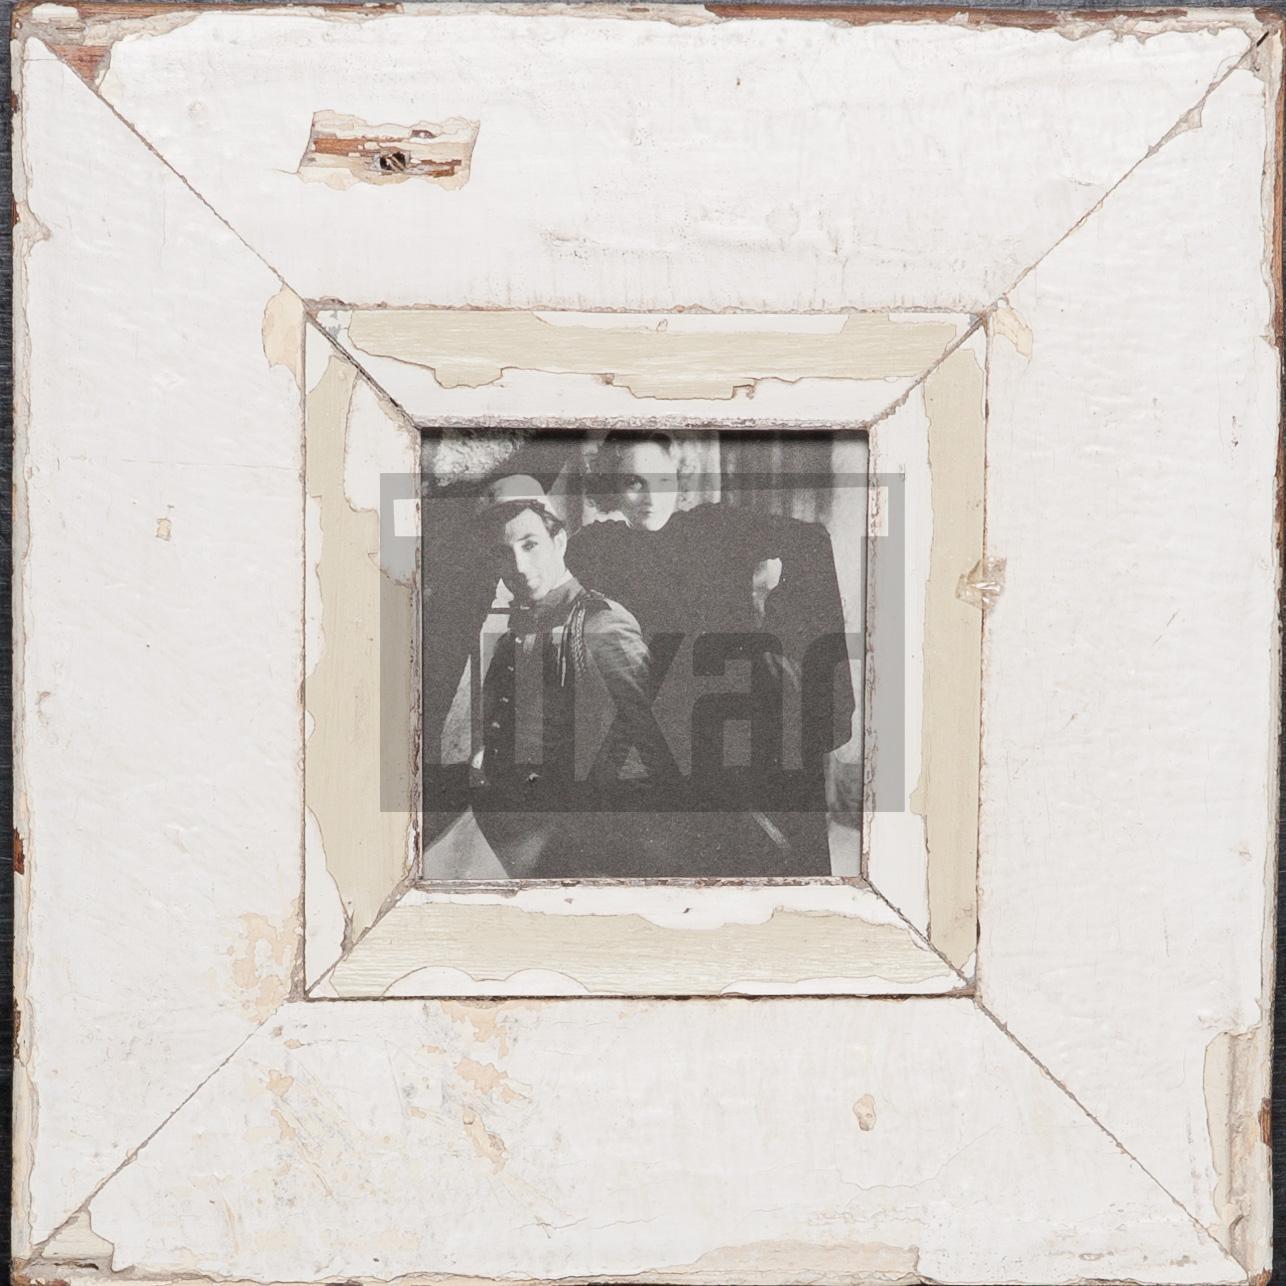 Quadratischer Bilderrahmen aus recyceltem Holz